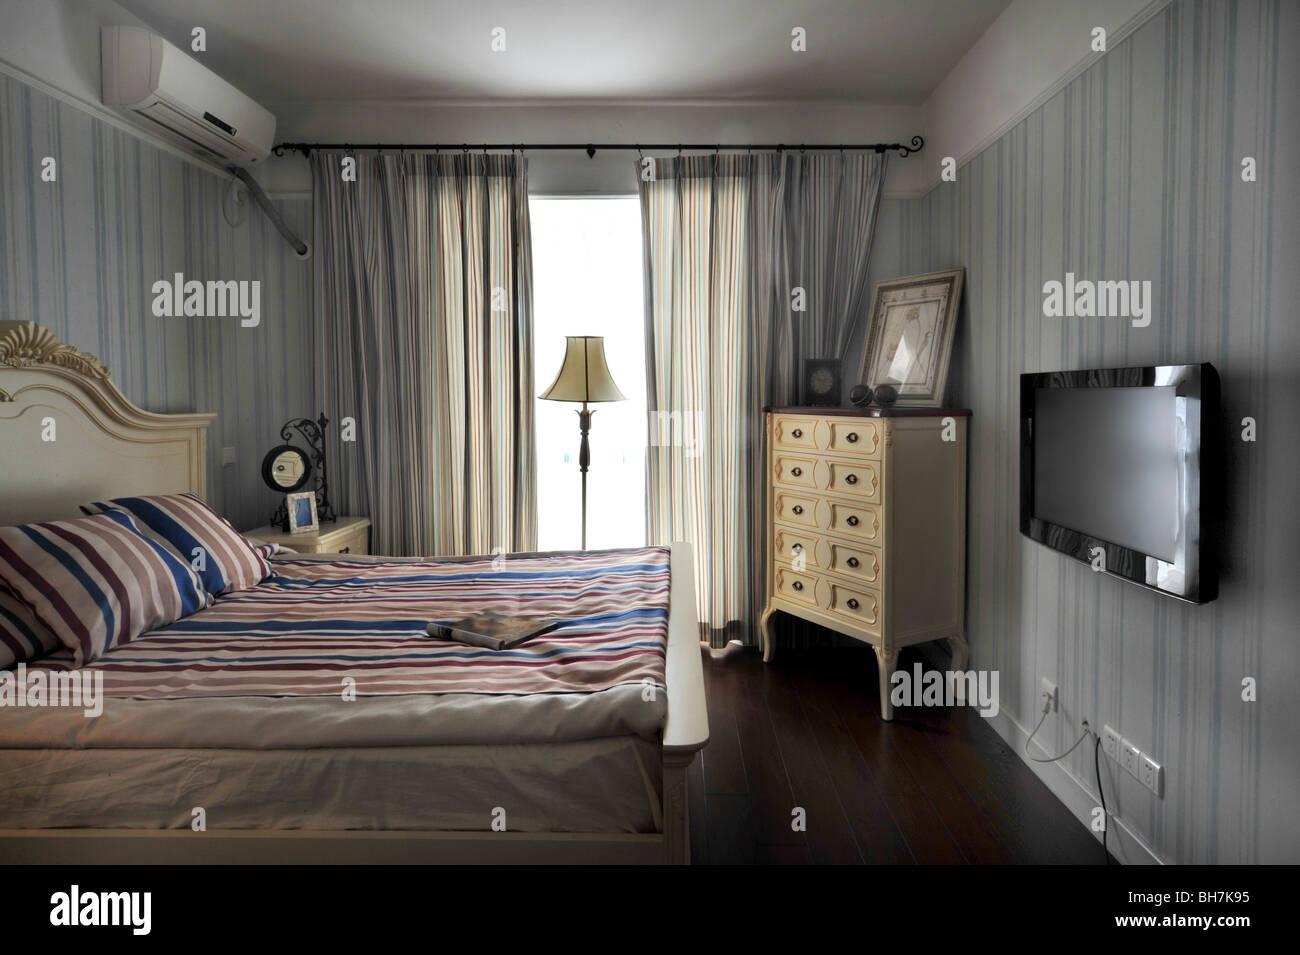 Bedroom interior - Stock Image